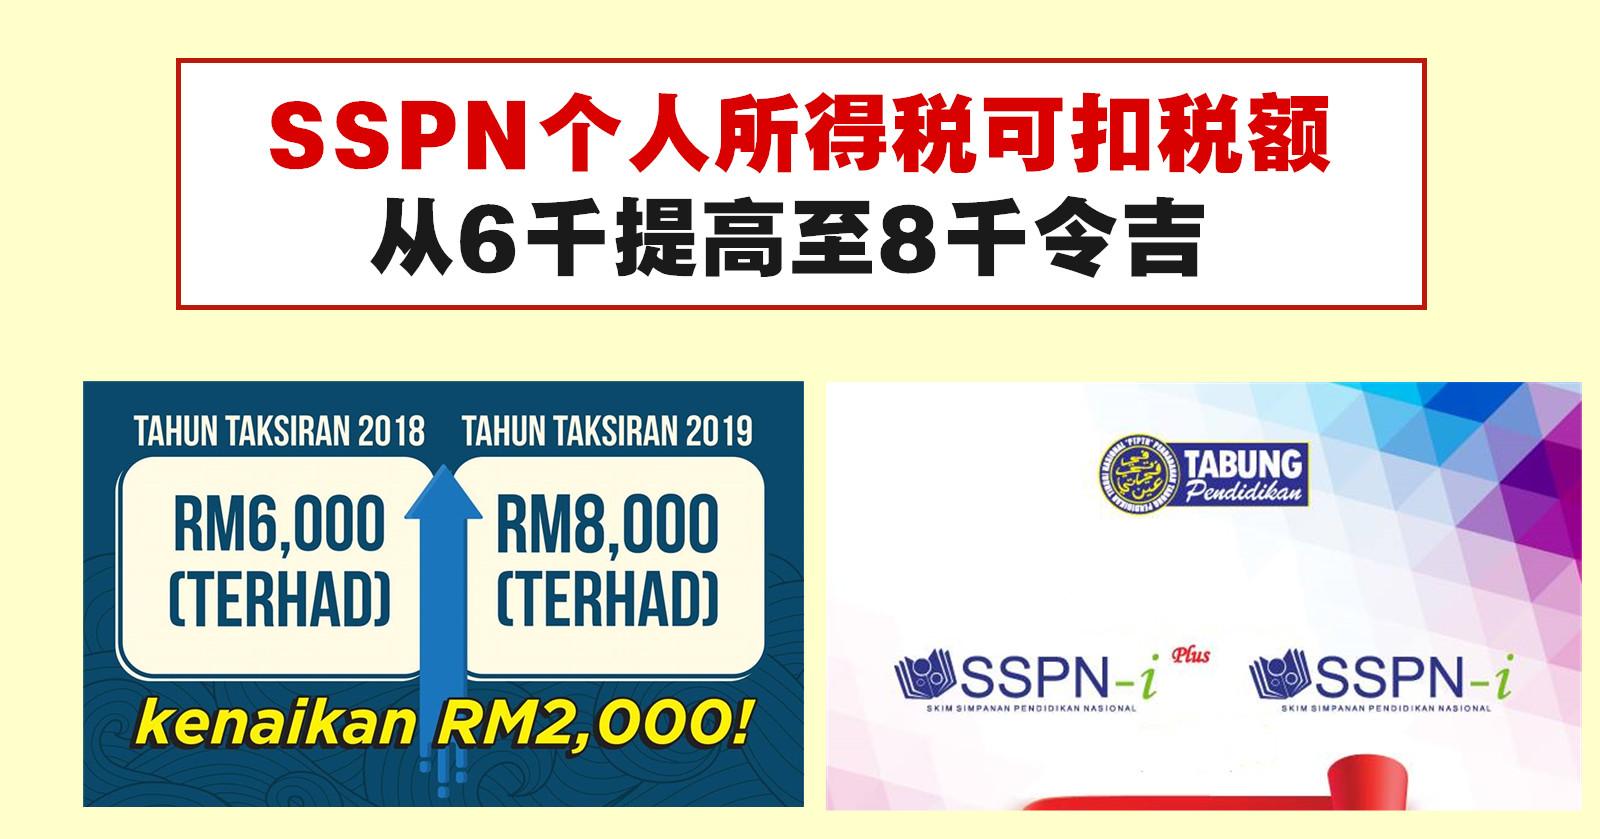 Sspn可扣税额从6千提高至8千令吉 Winrayland